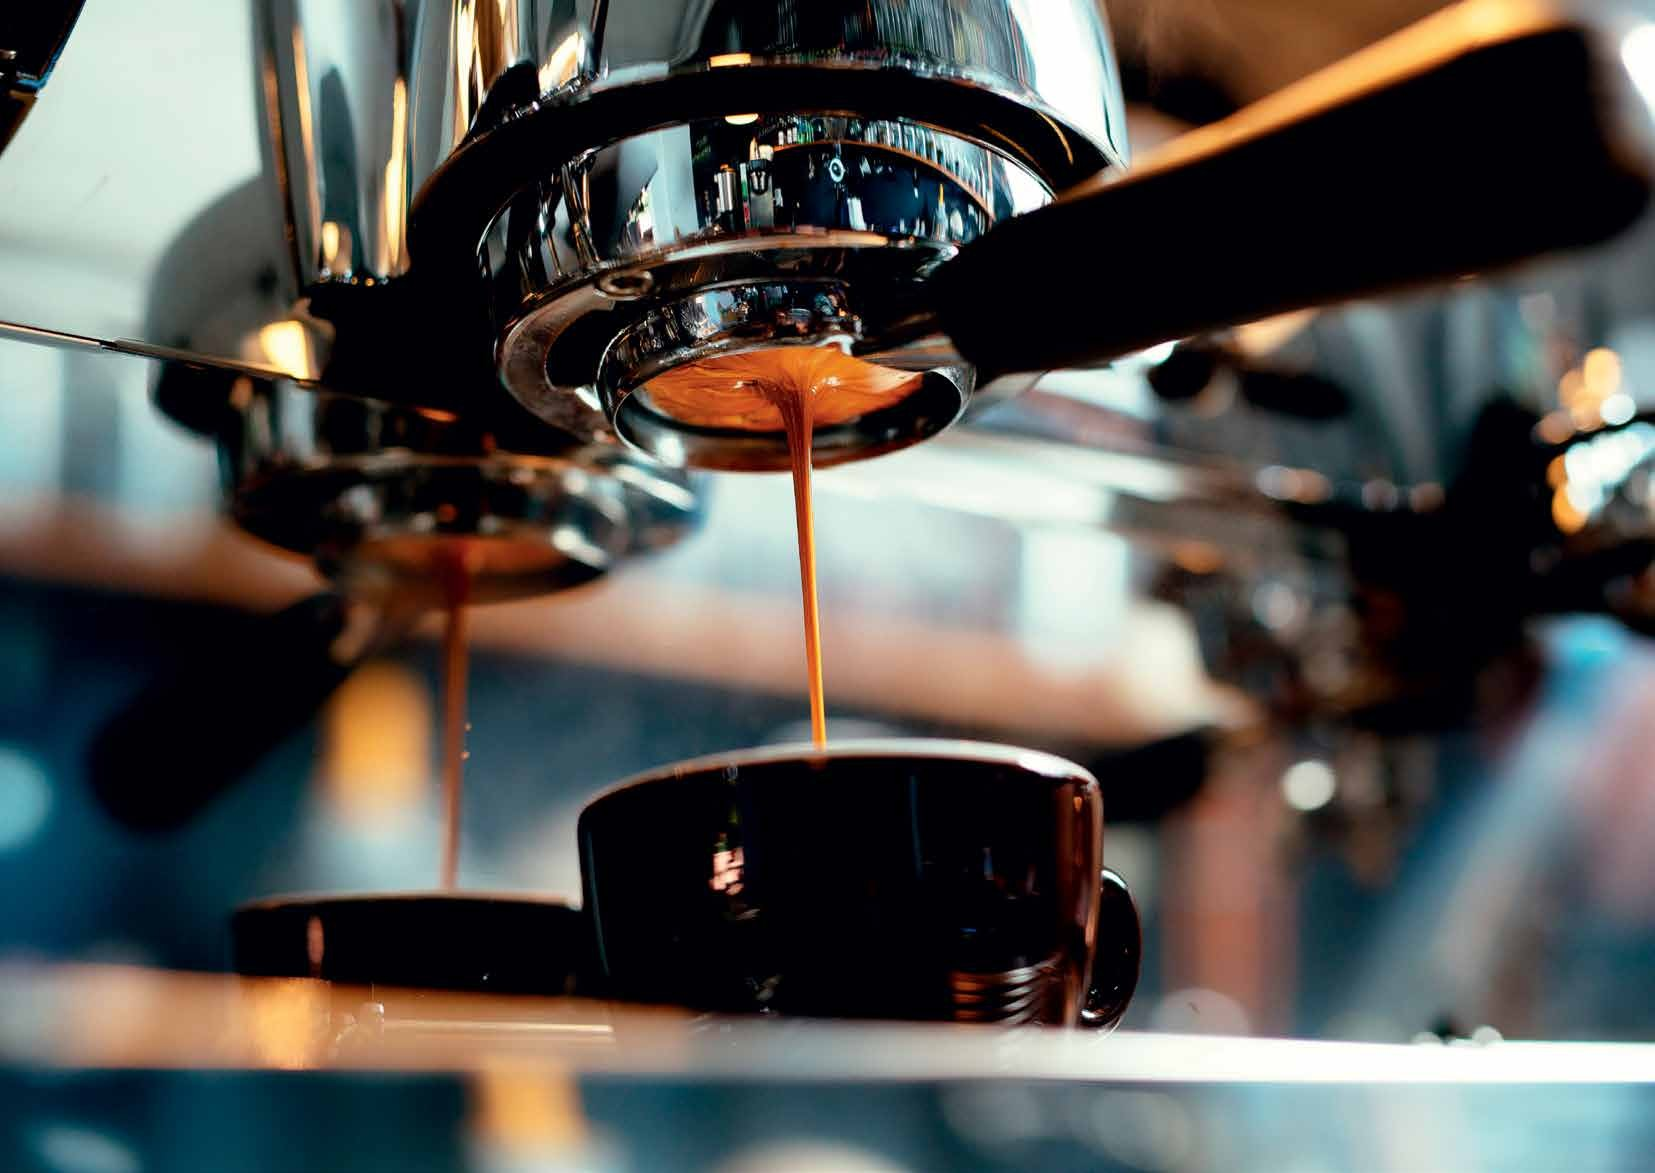 Cafe/Restaurant/Retail - Major Opportunity To Monopolize Brand New Venture!